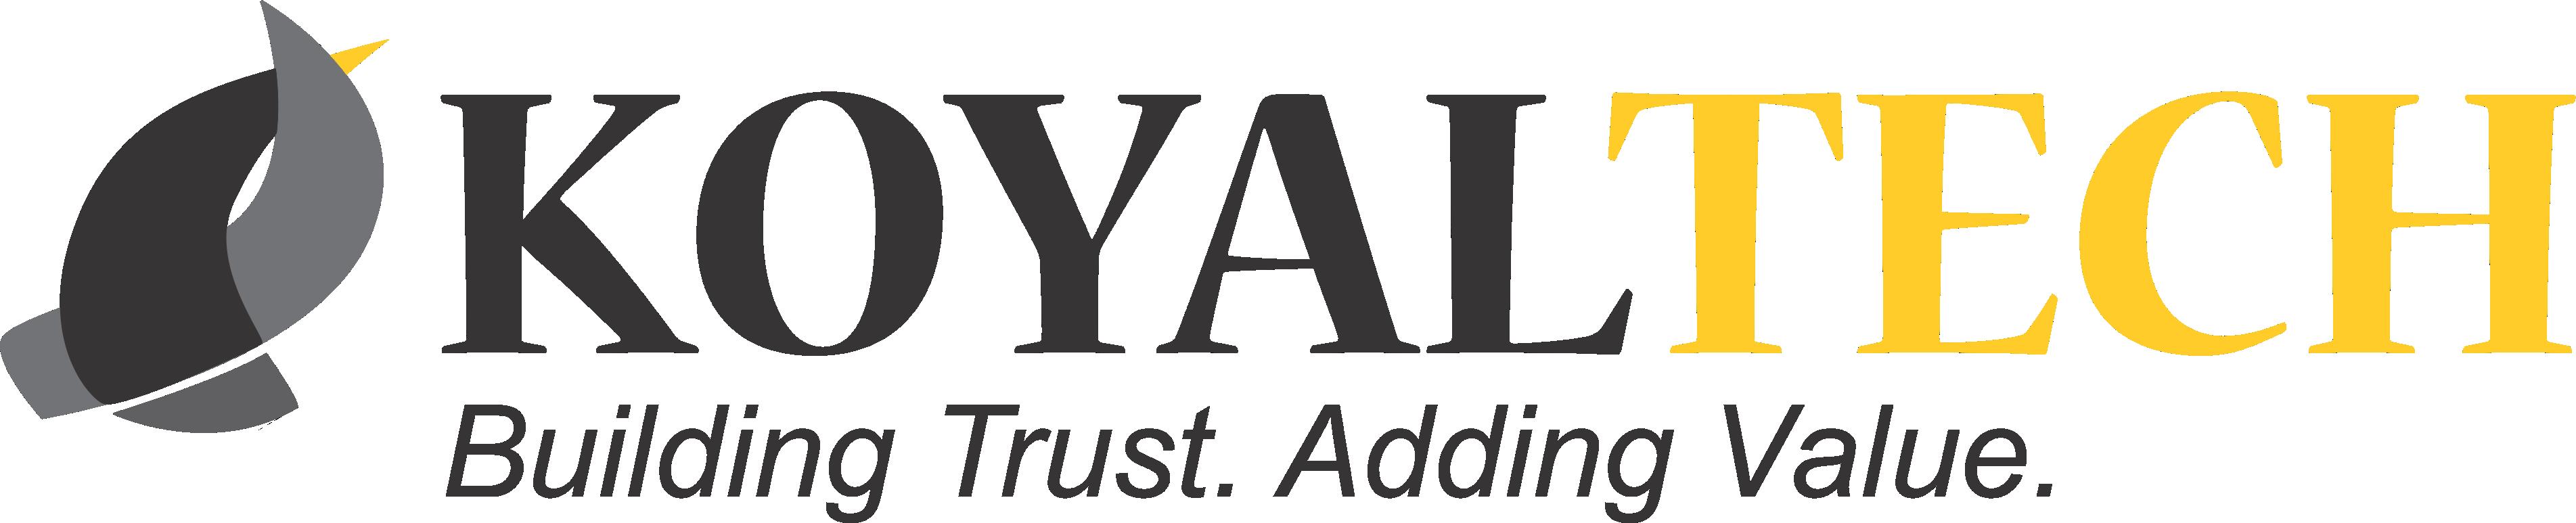 KoyalTech